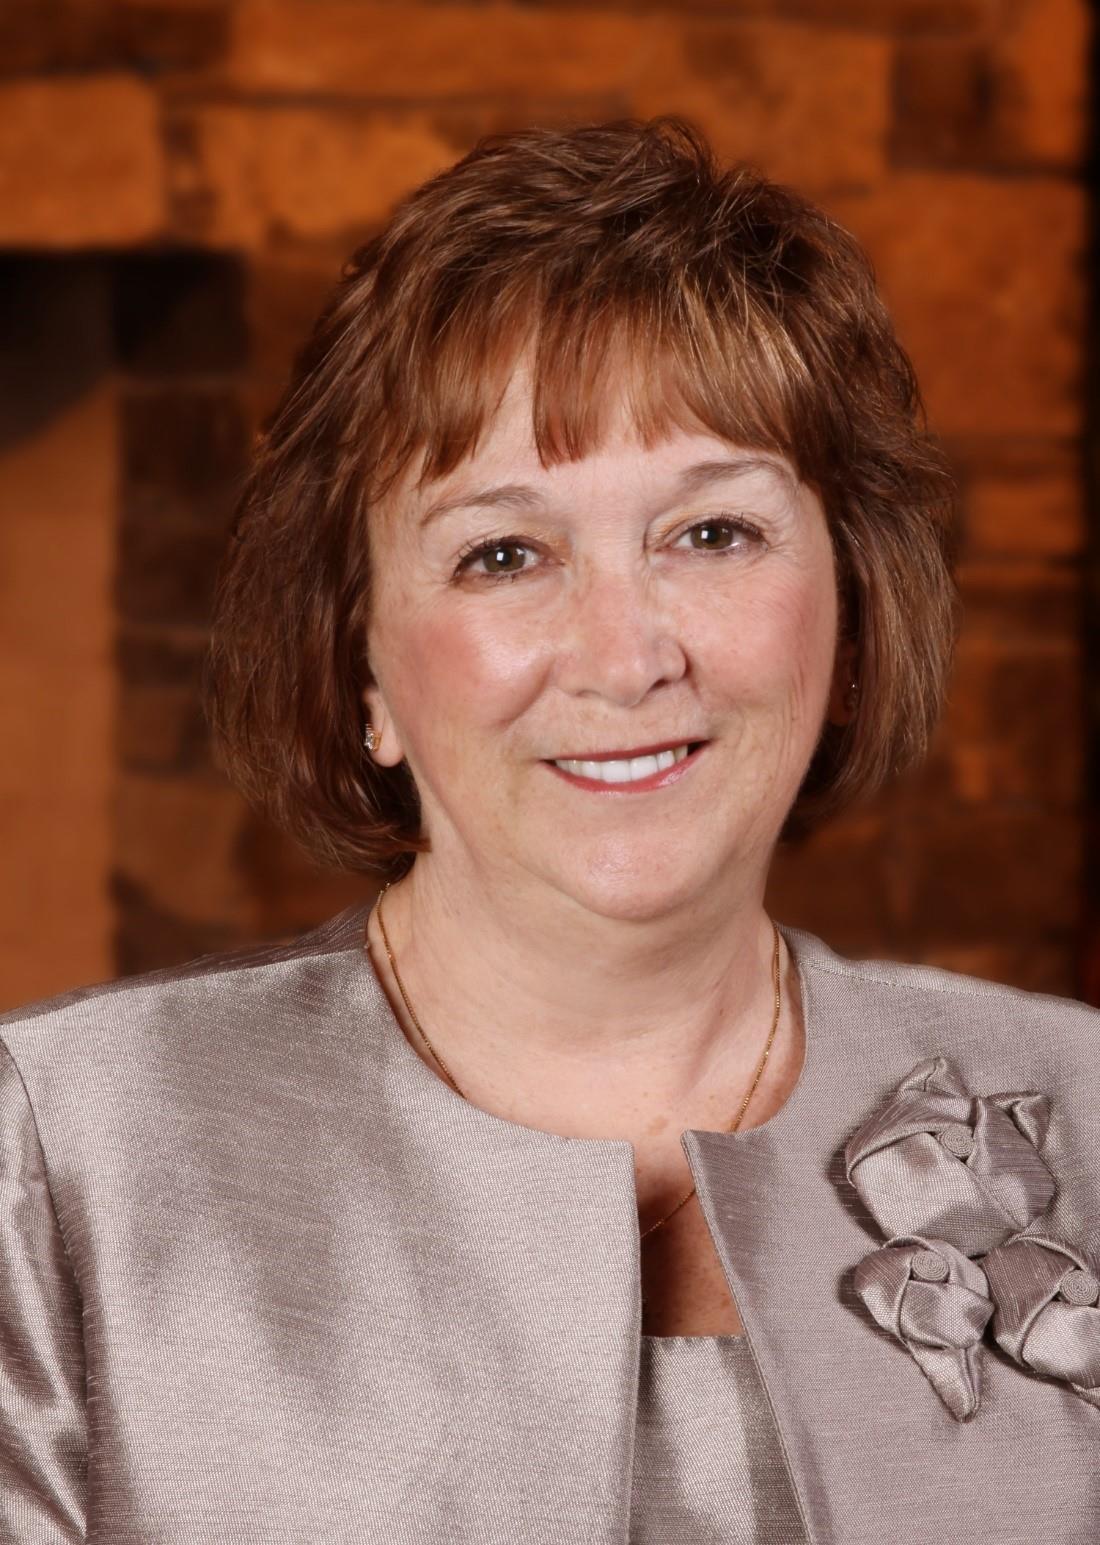 Photo of Committee Chair Deborah Glisson